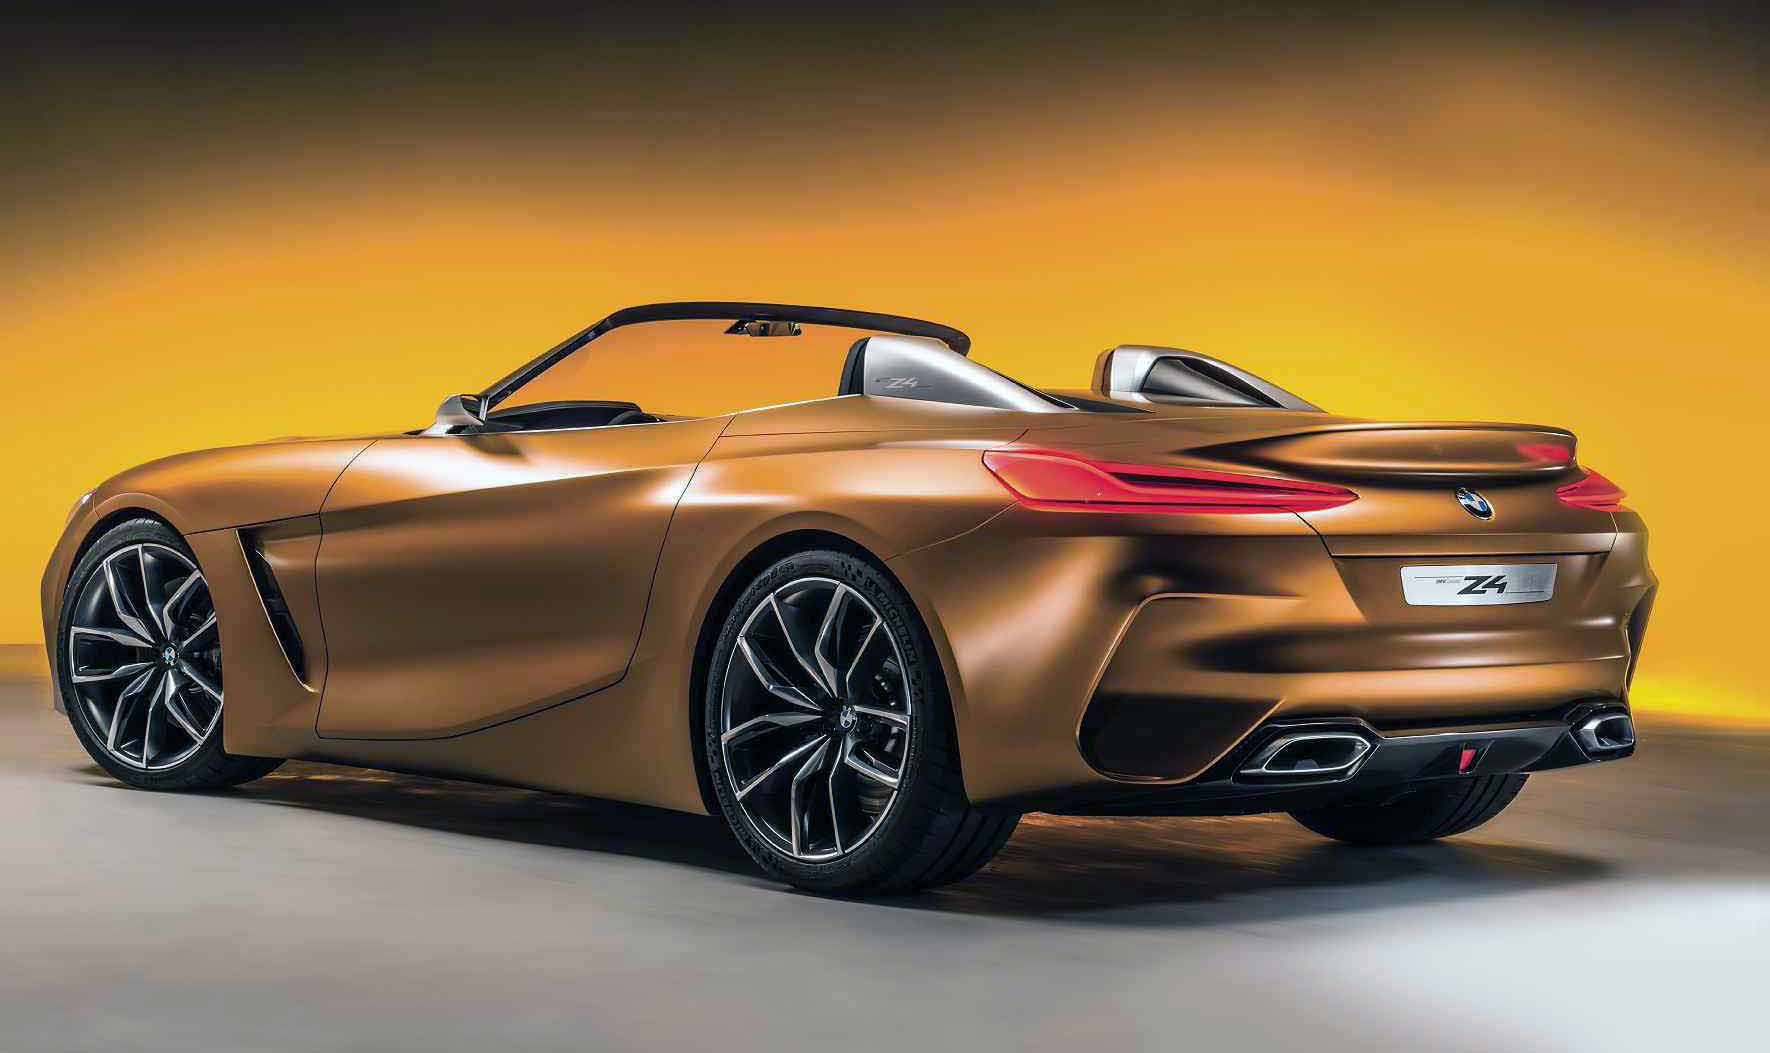 2017 BMW Z4 G29 Concept